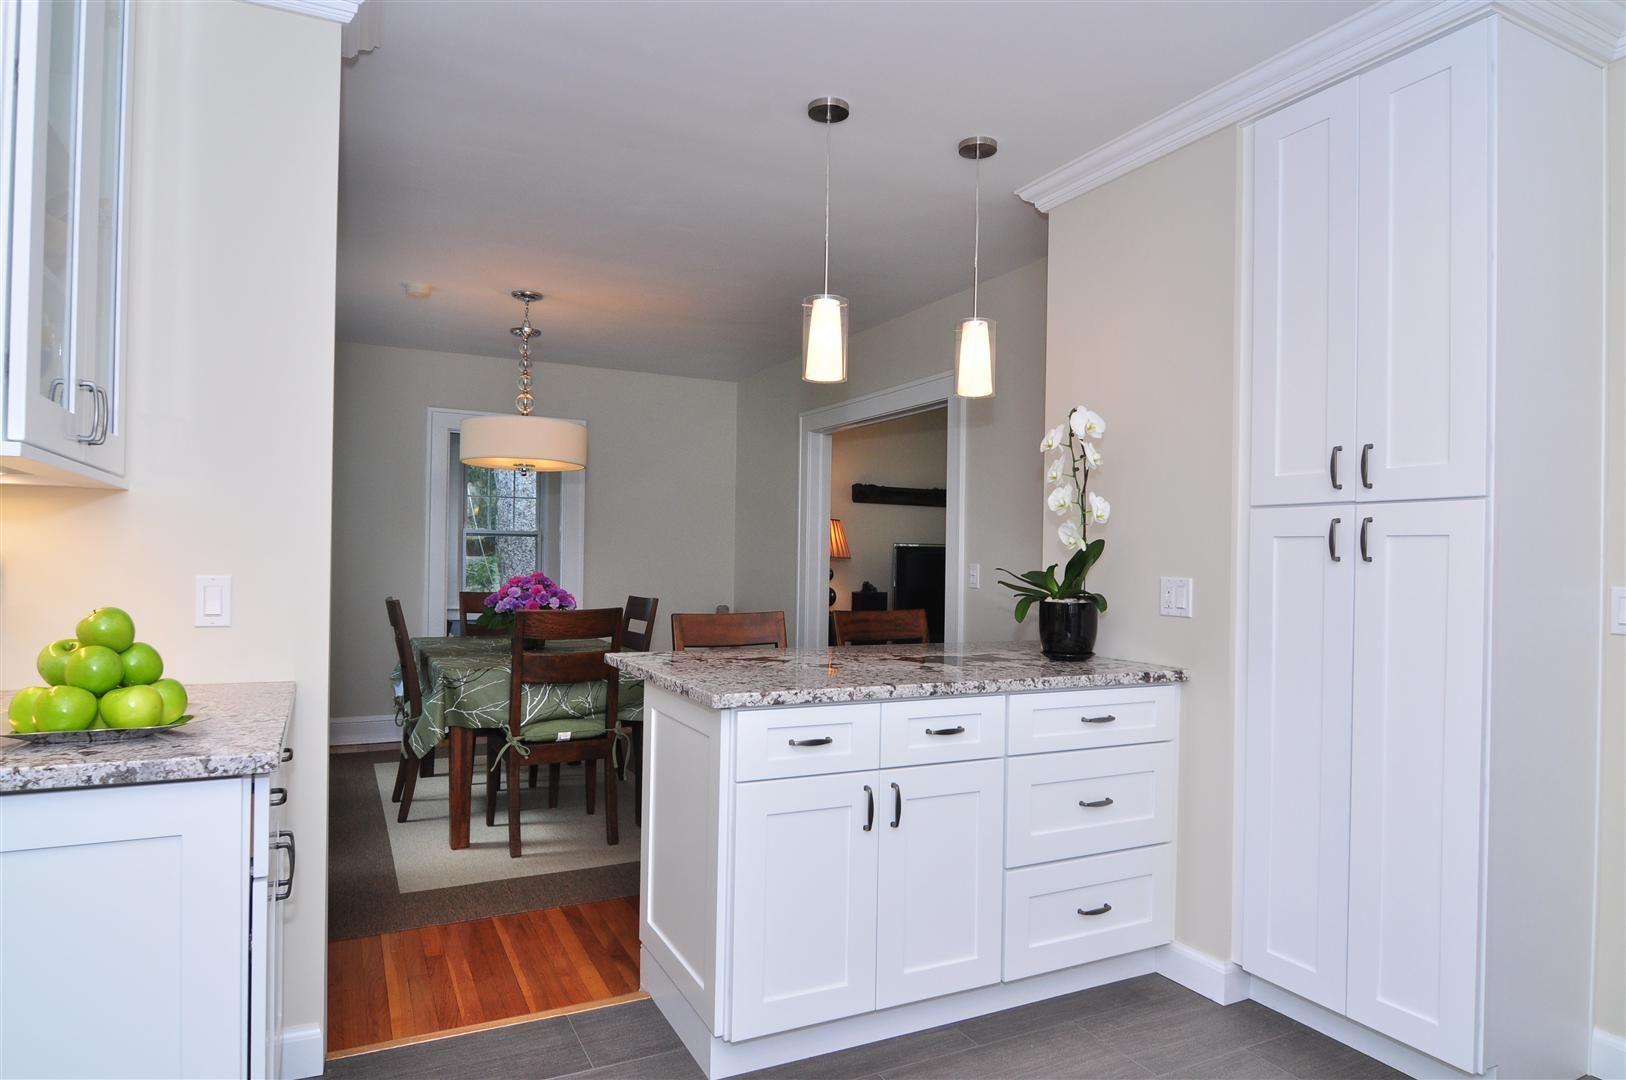 Buy white shaker kitchen cabinets wholesale - Buy Discount Wood Assembled Kitchen Cabinets Wholesale Online White Shaker